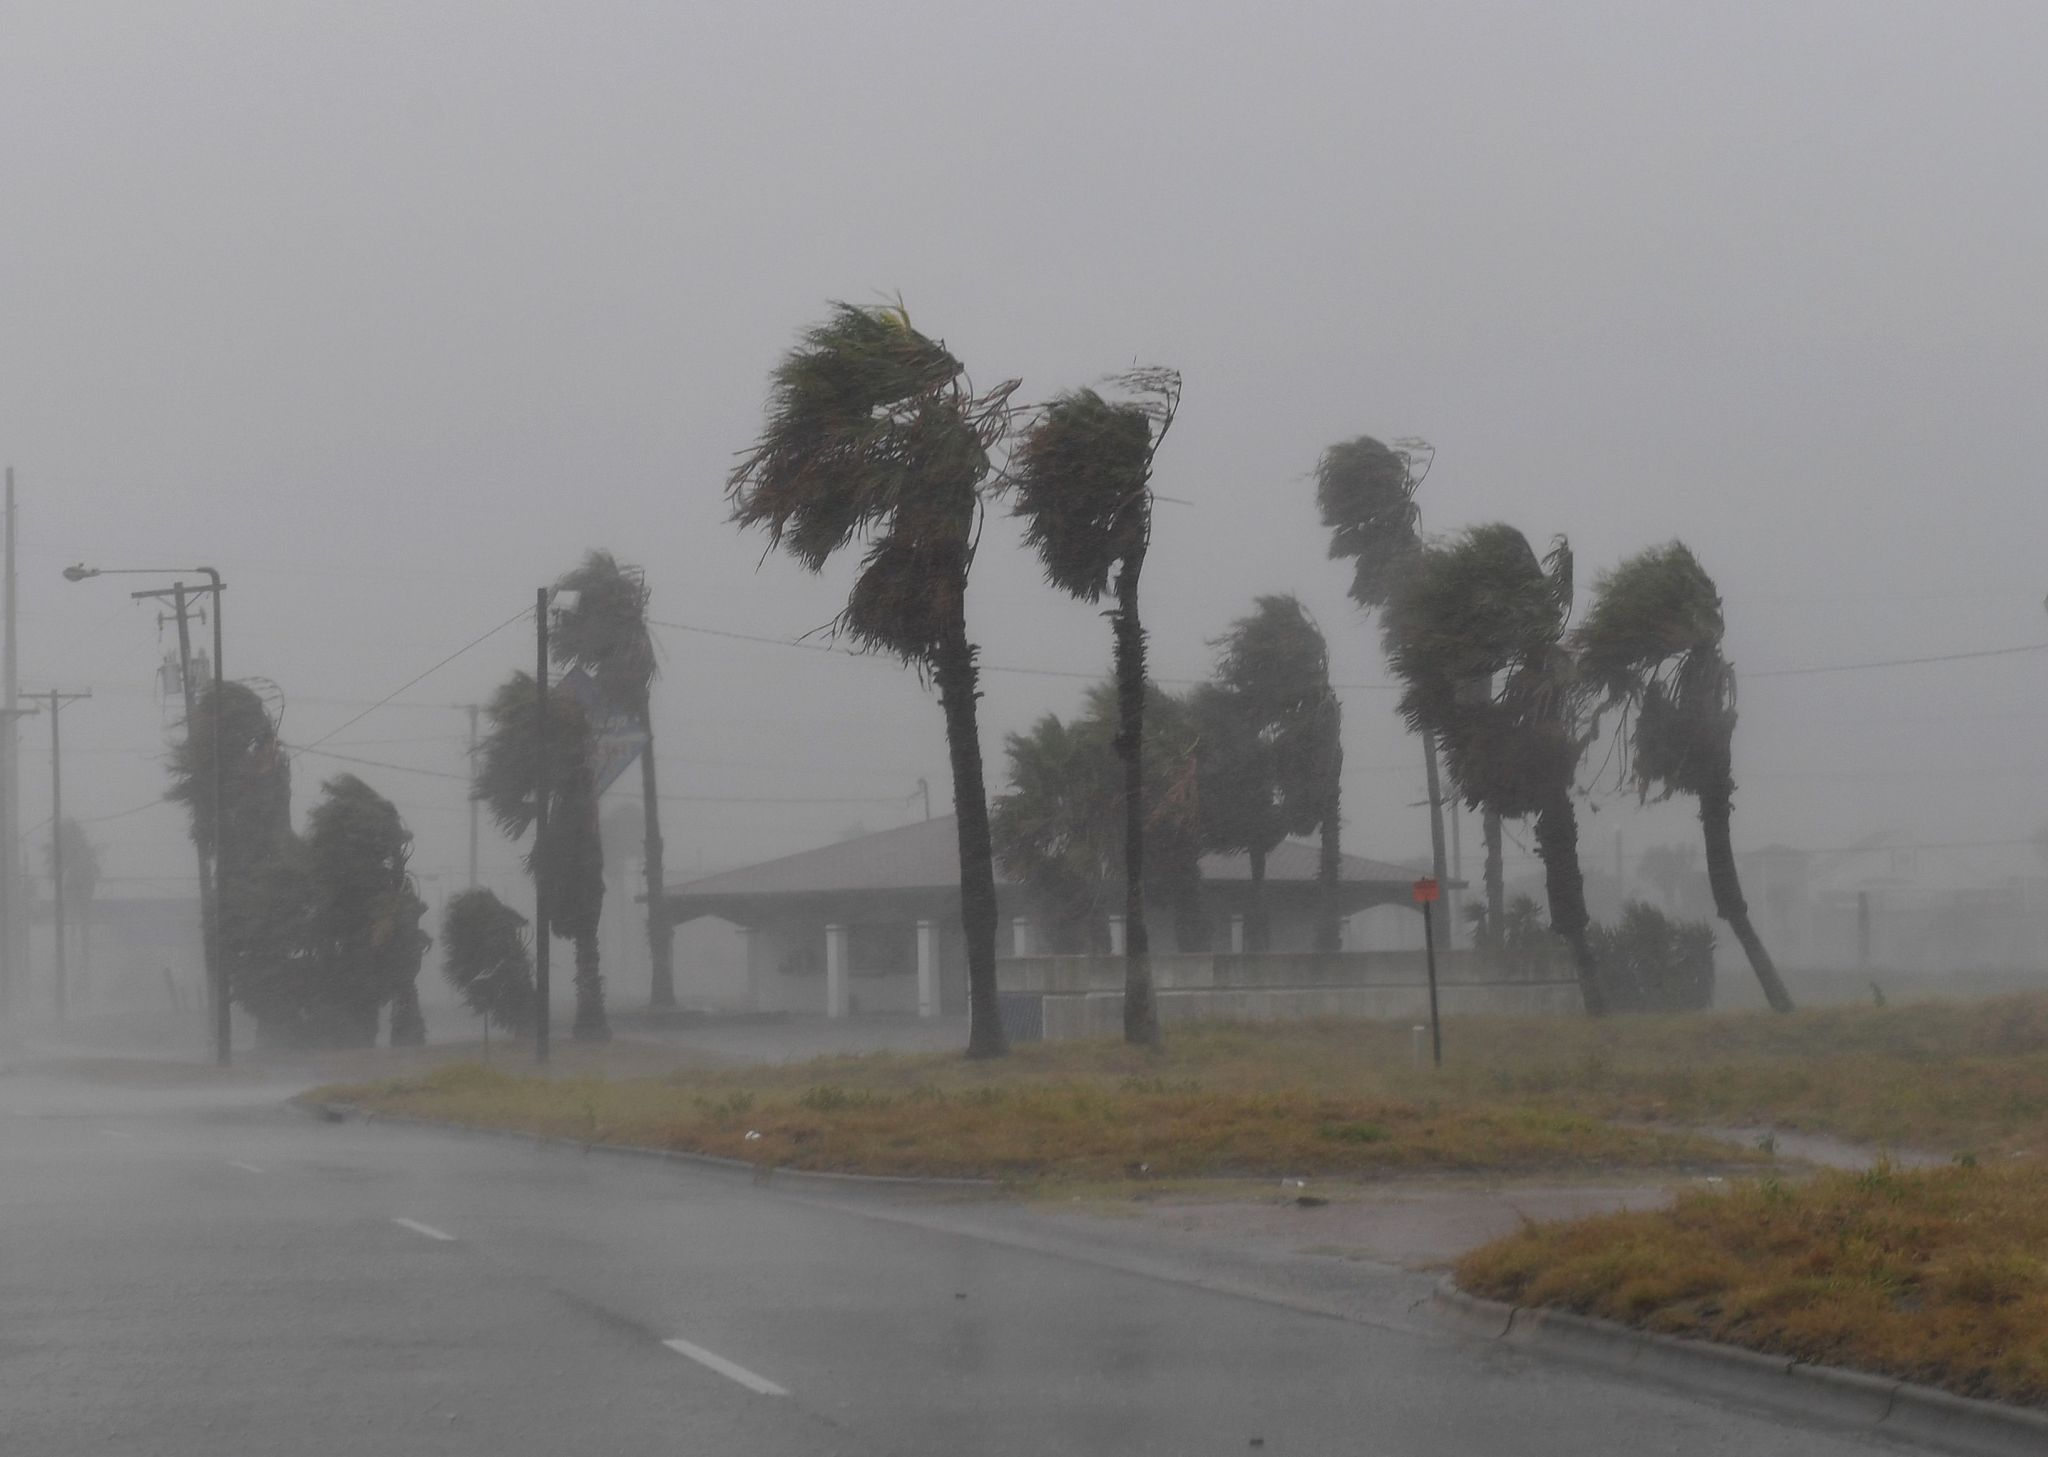 Corpus Christi newspaper staff evacuates to shelter due to Hurricane Harvey - Houston Chronicle